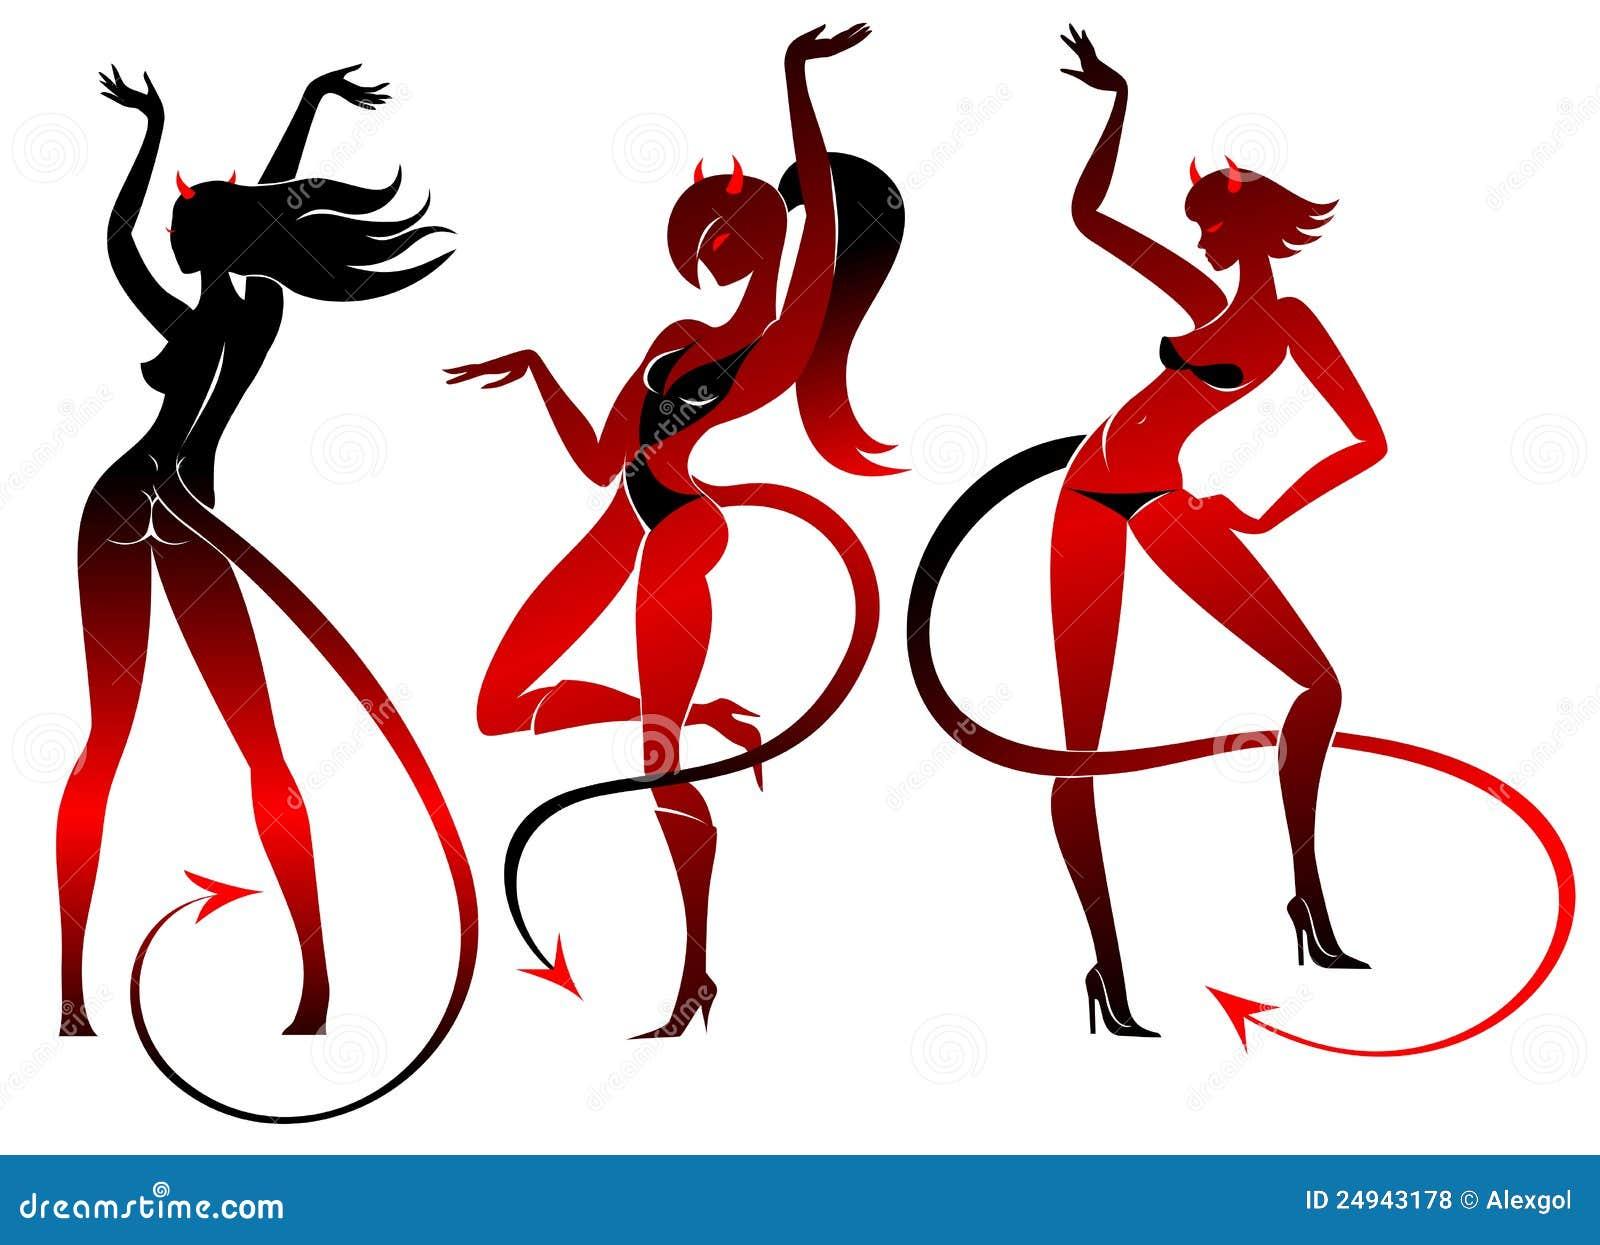 Devil Dancing Girls Silhouettes Set Royalty Free Stock Photos - Image ...